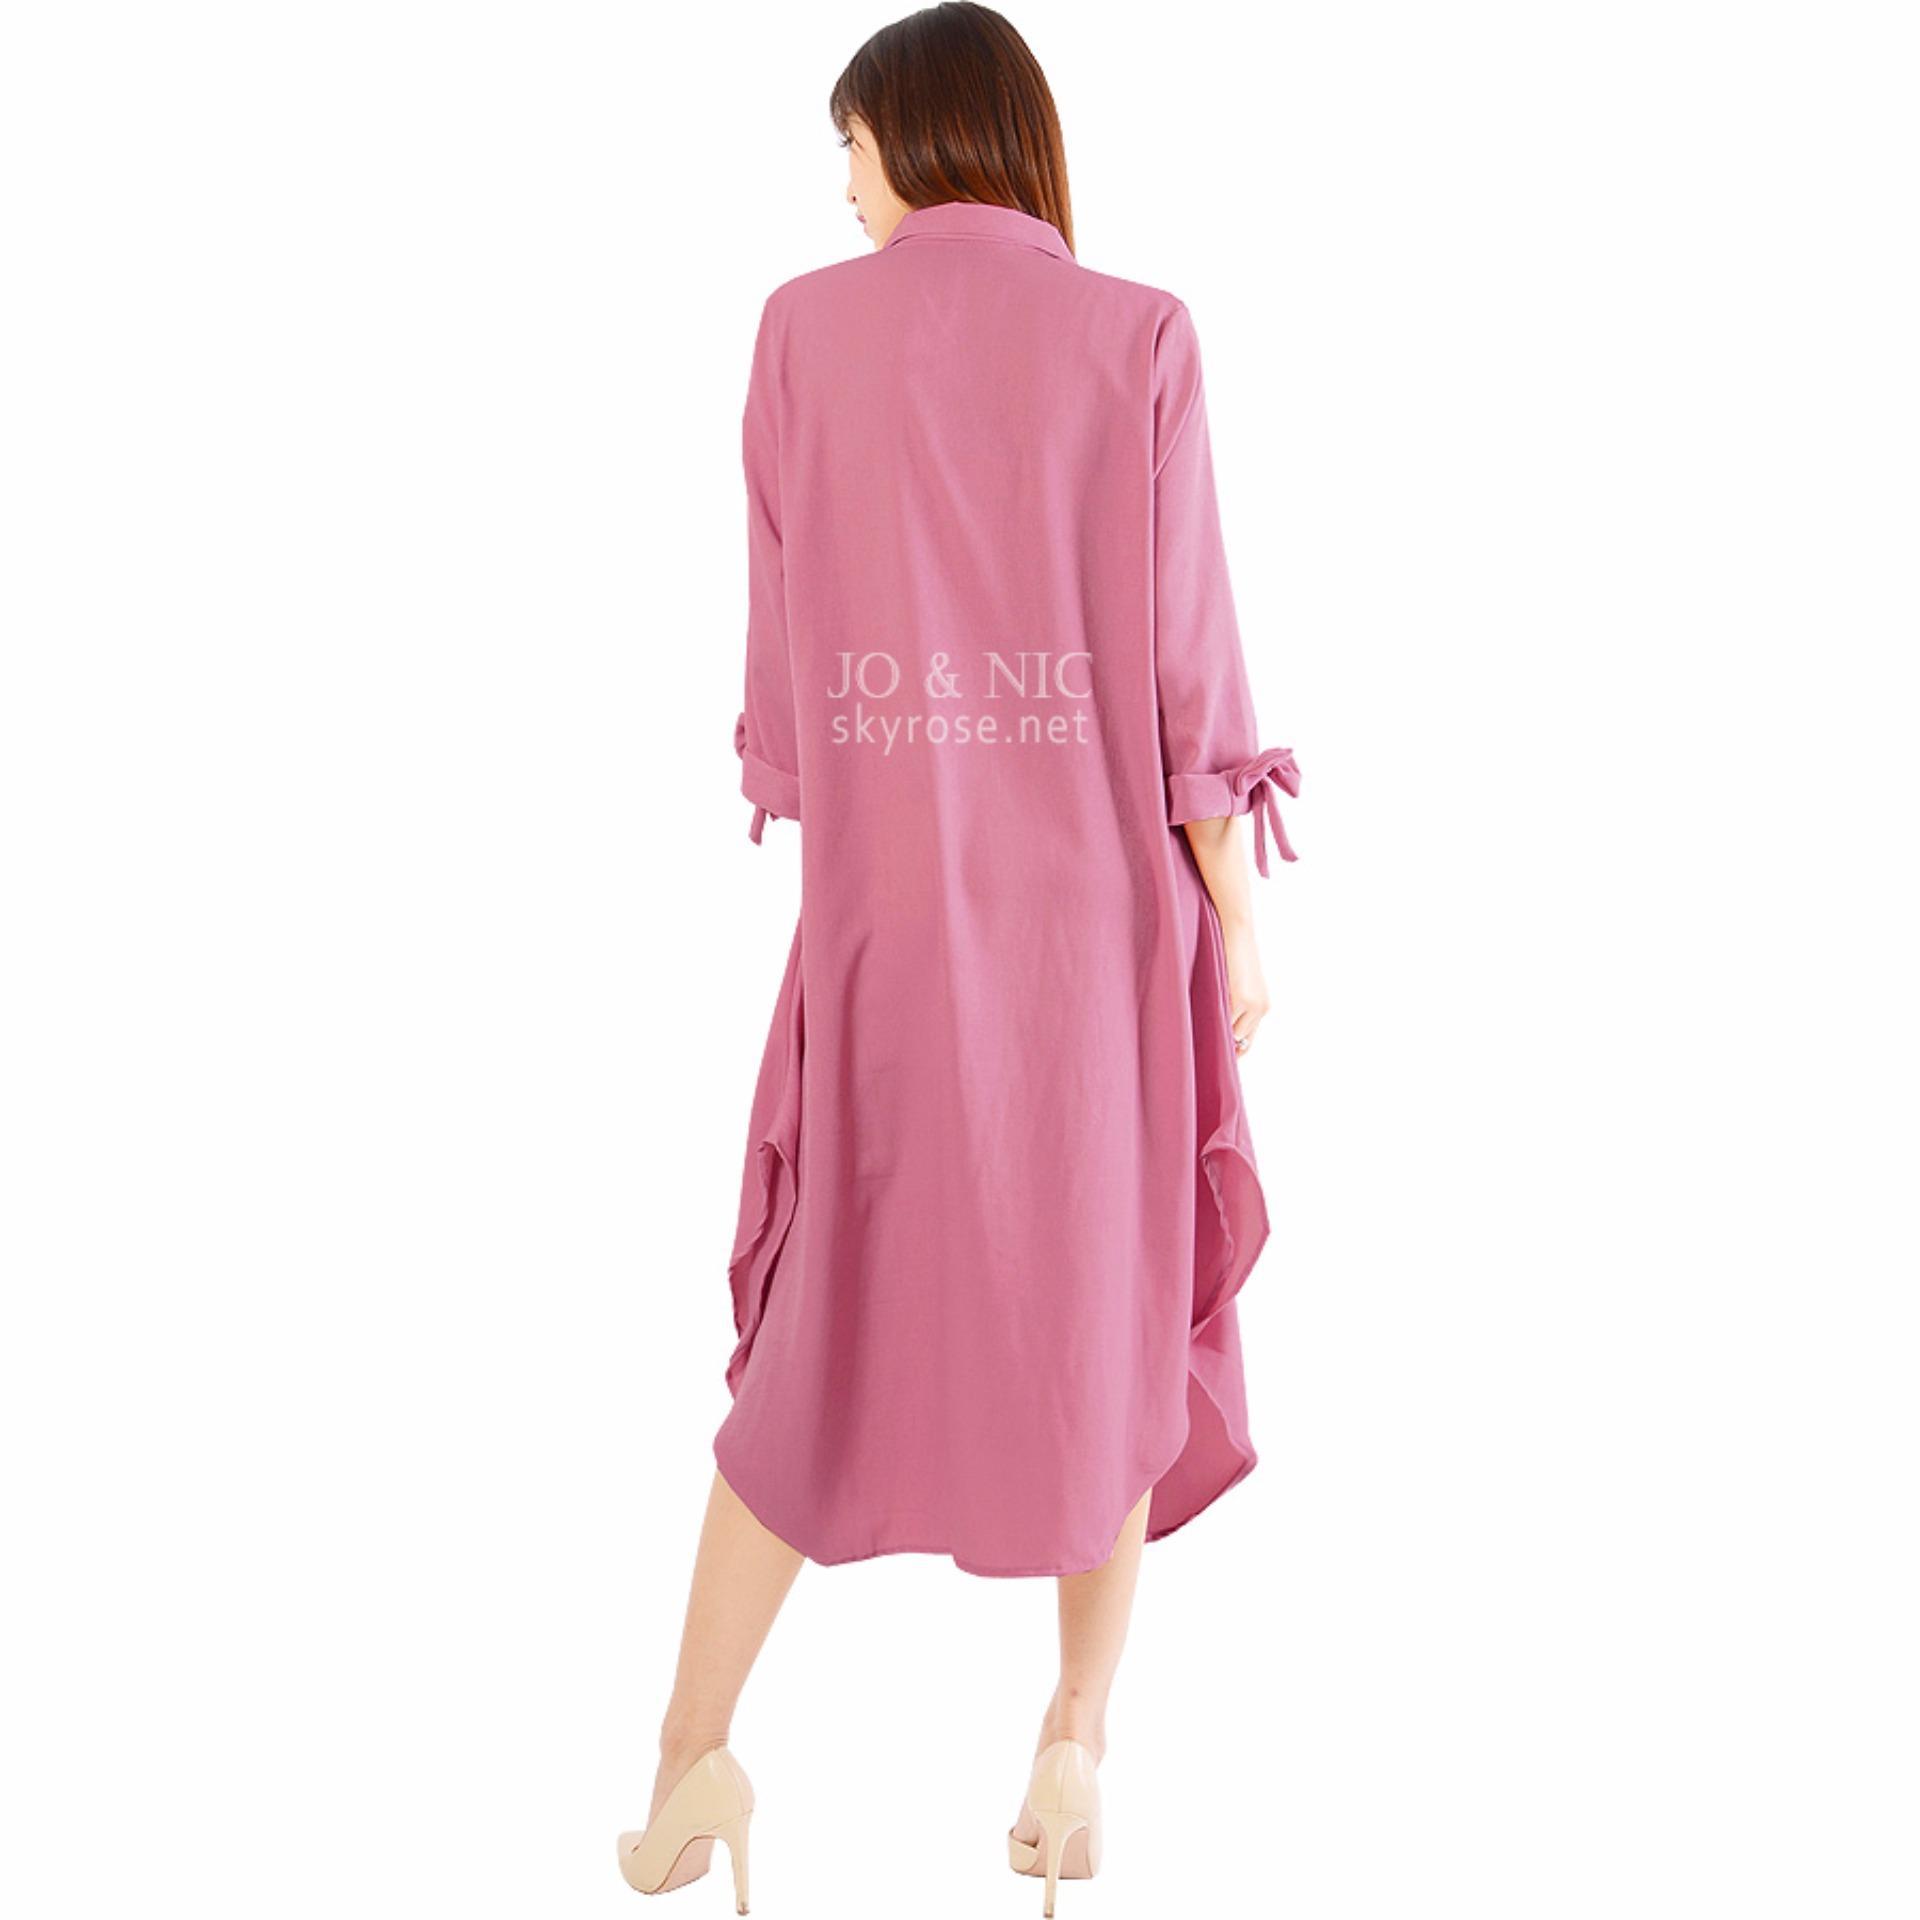 Jo Nic Ashley Dress Tunik Lengan Pita Beige Daftar Harga Bodytalk Panjang Black And Red 74019t6br Hitam M Hijab Wanita Allsize Pink